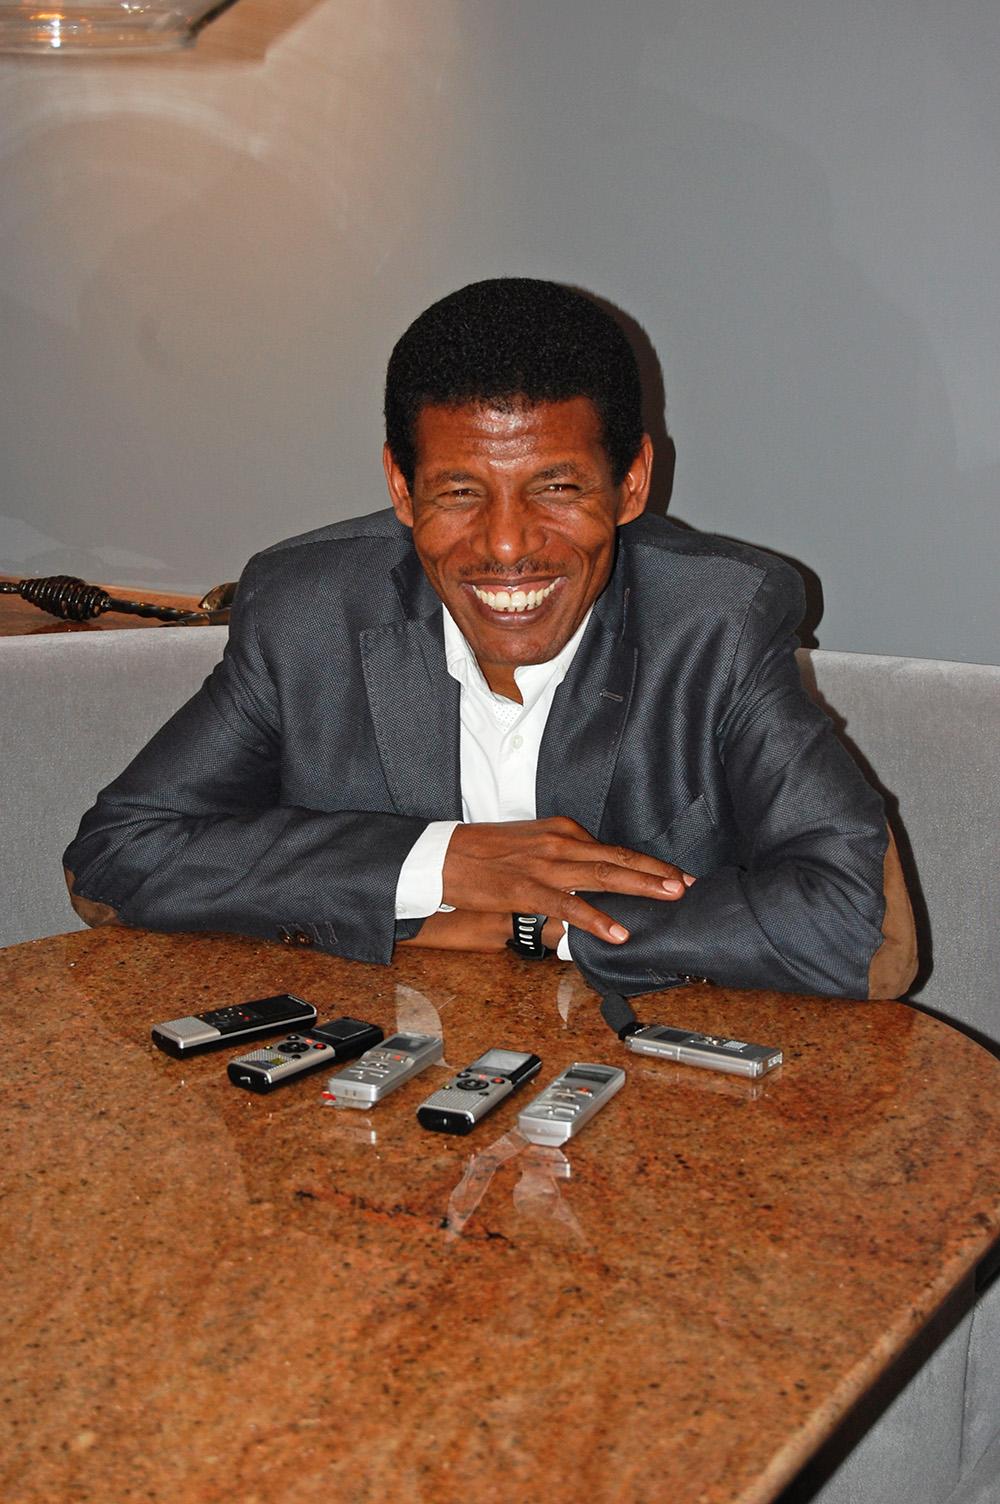 Ethiopian Marathon Legend Haile Gebrselassie